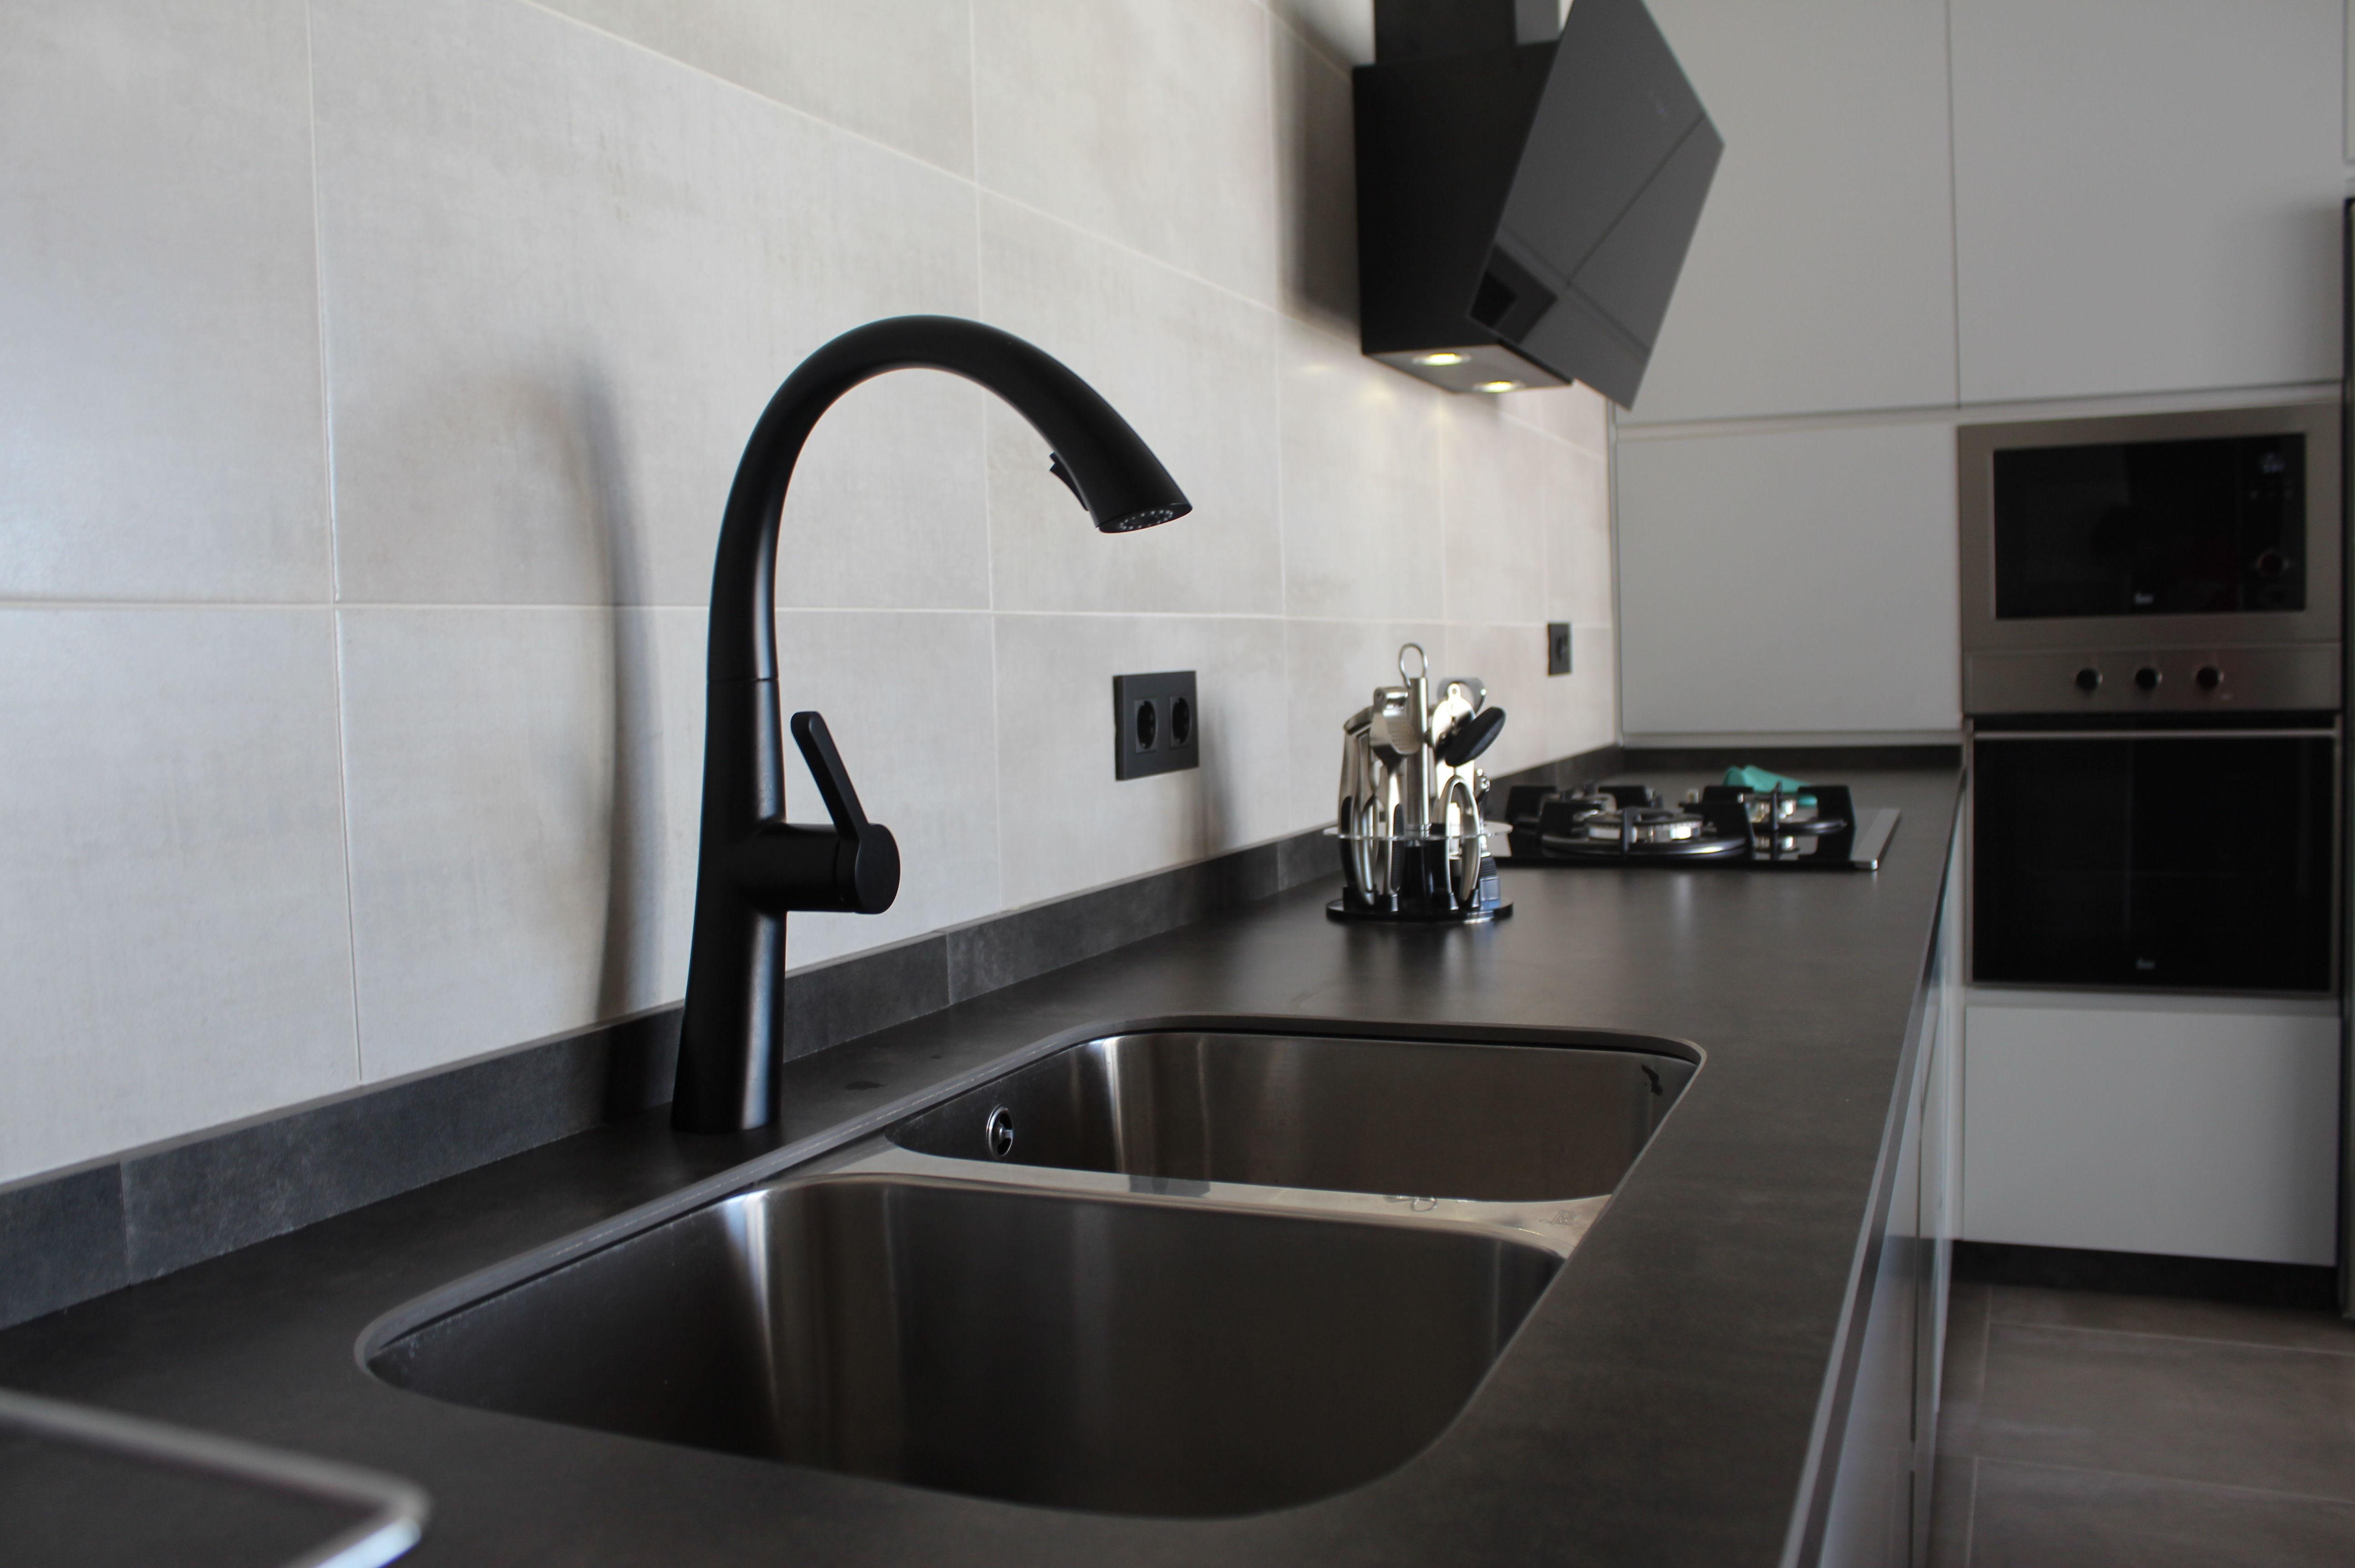 Cocina serie Luxe con encimera color óxido. últimas tendencias en diseño de cocinas